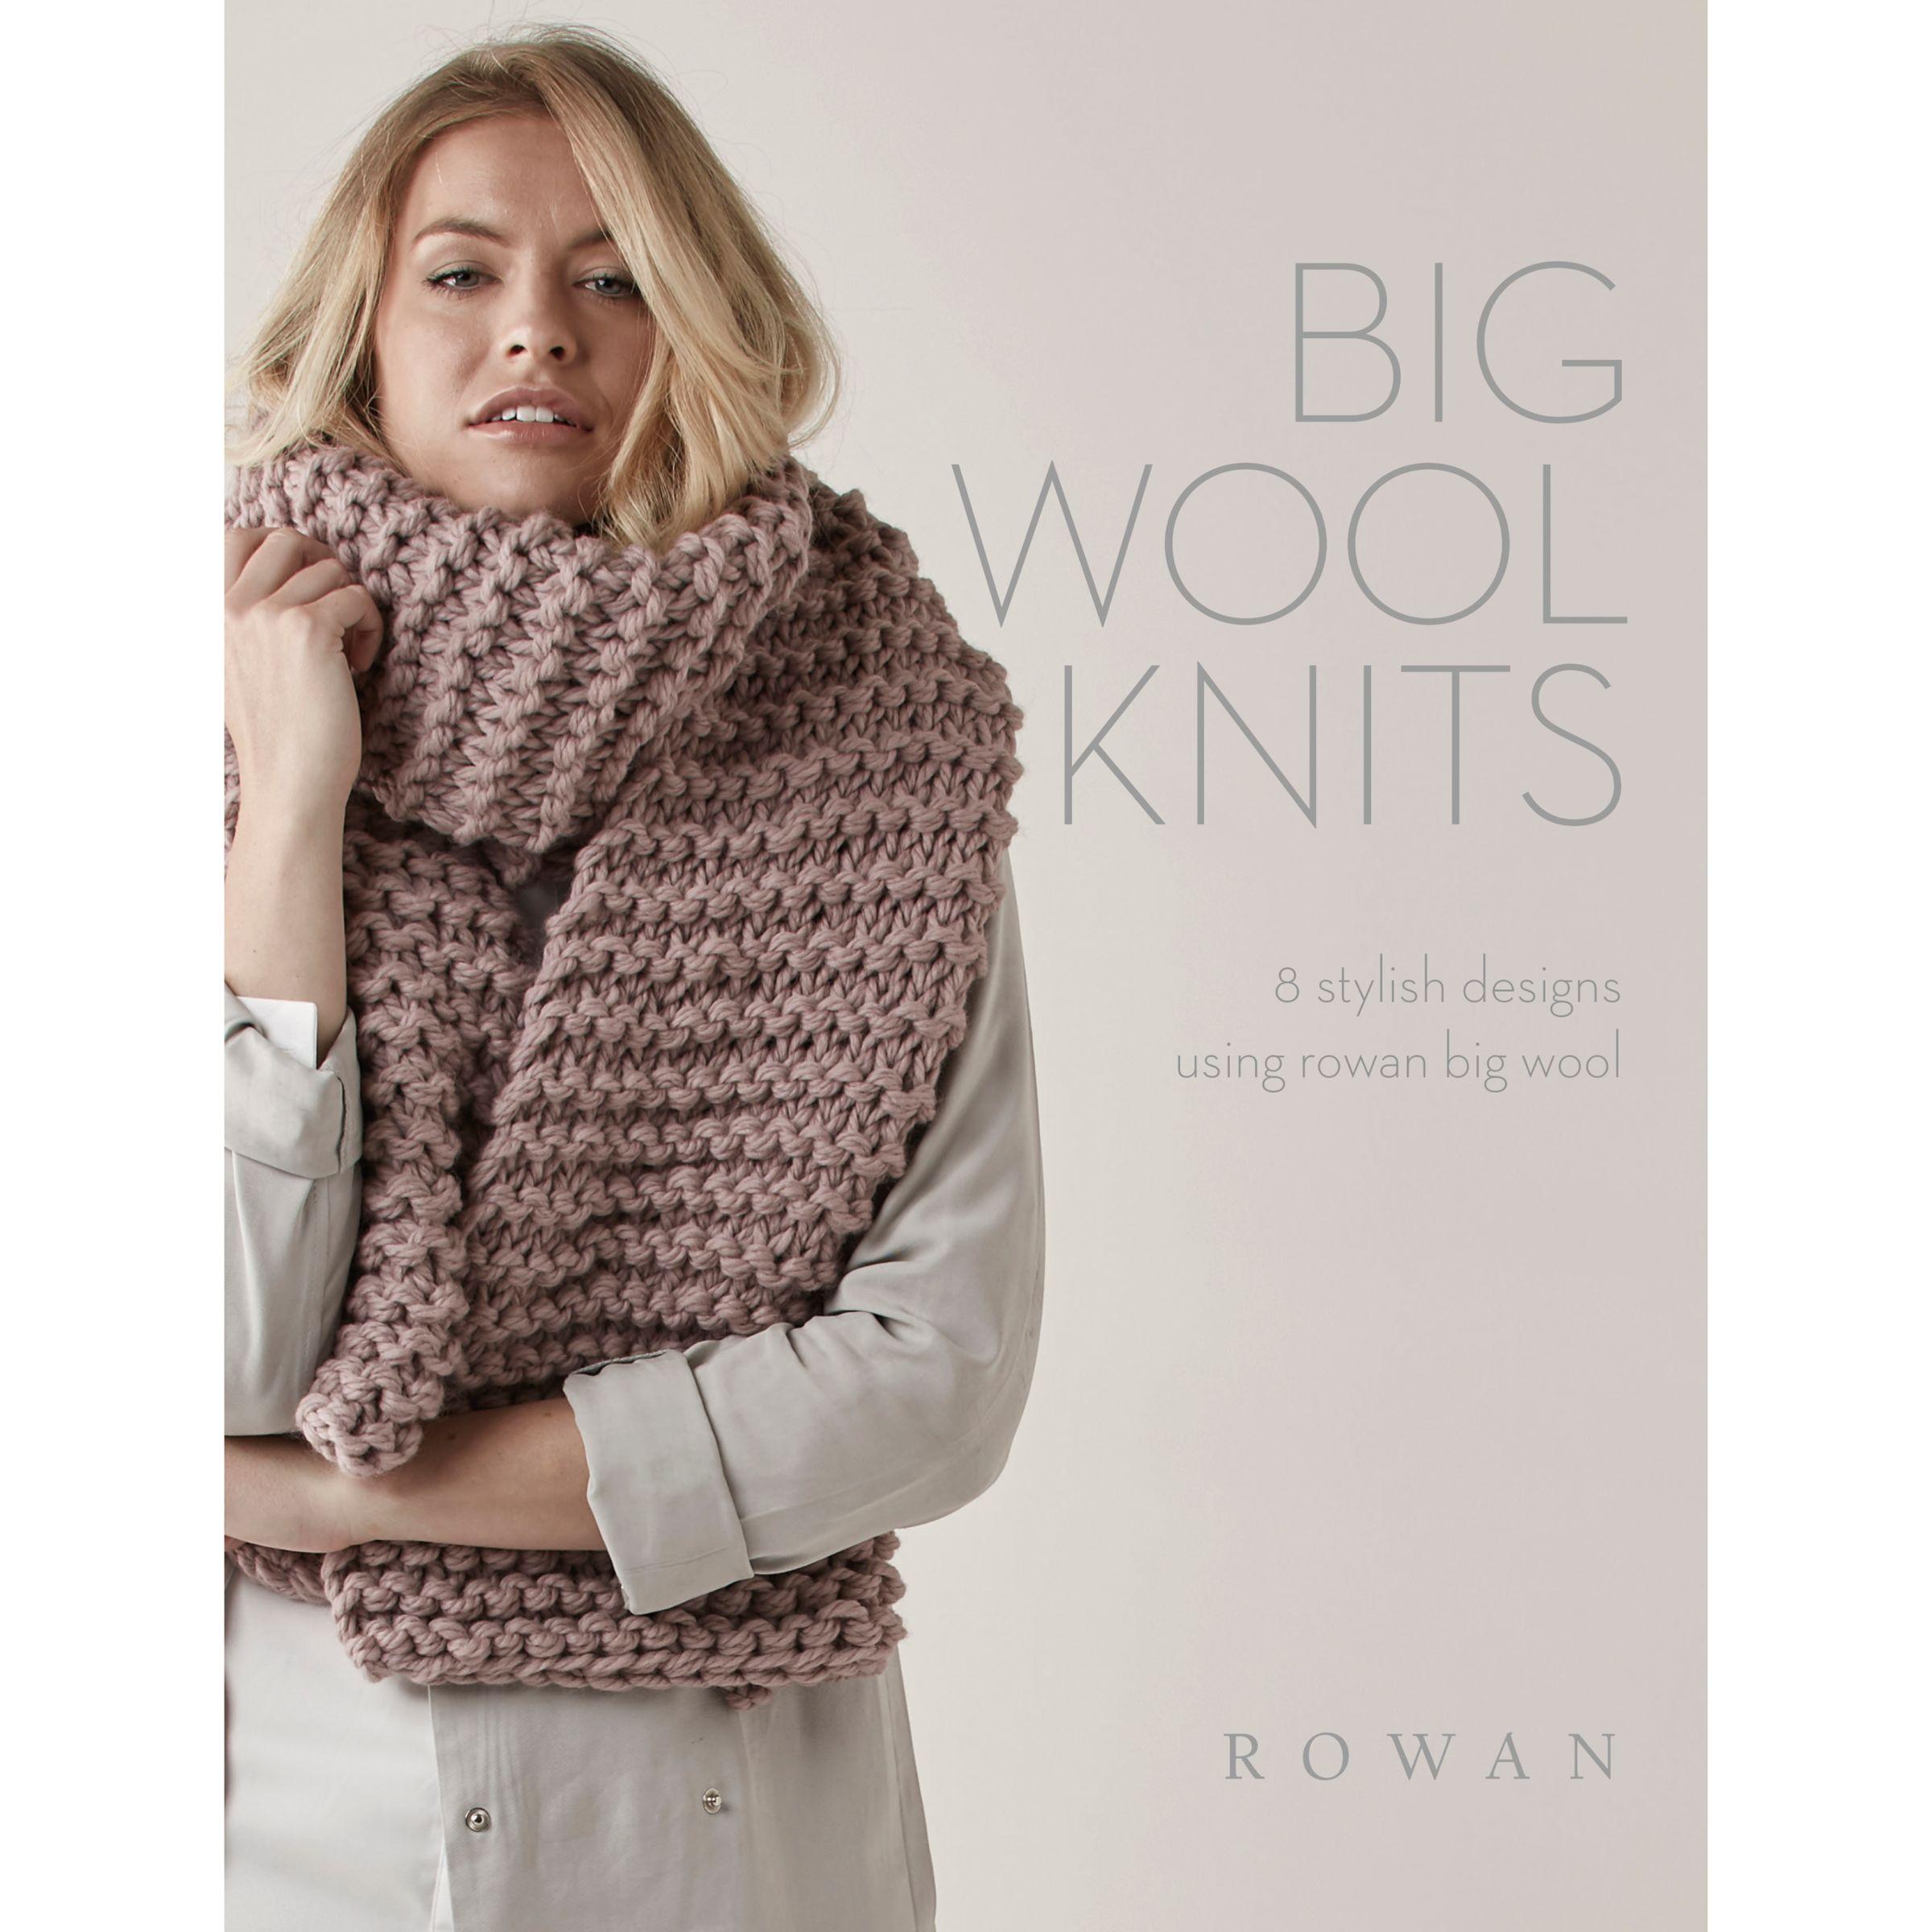 Rowan Rowan Big Wool Knits Knitting Pattern Brochure